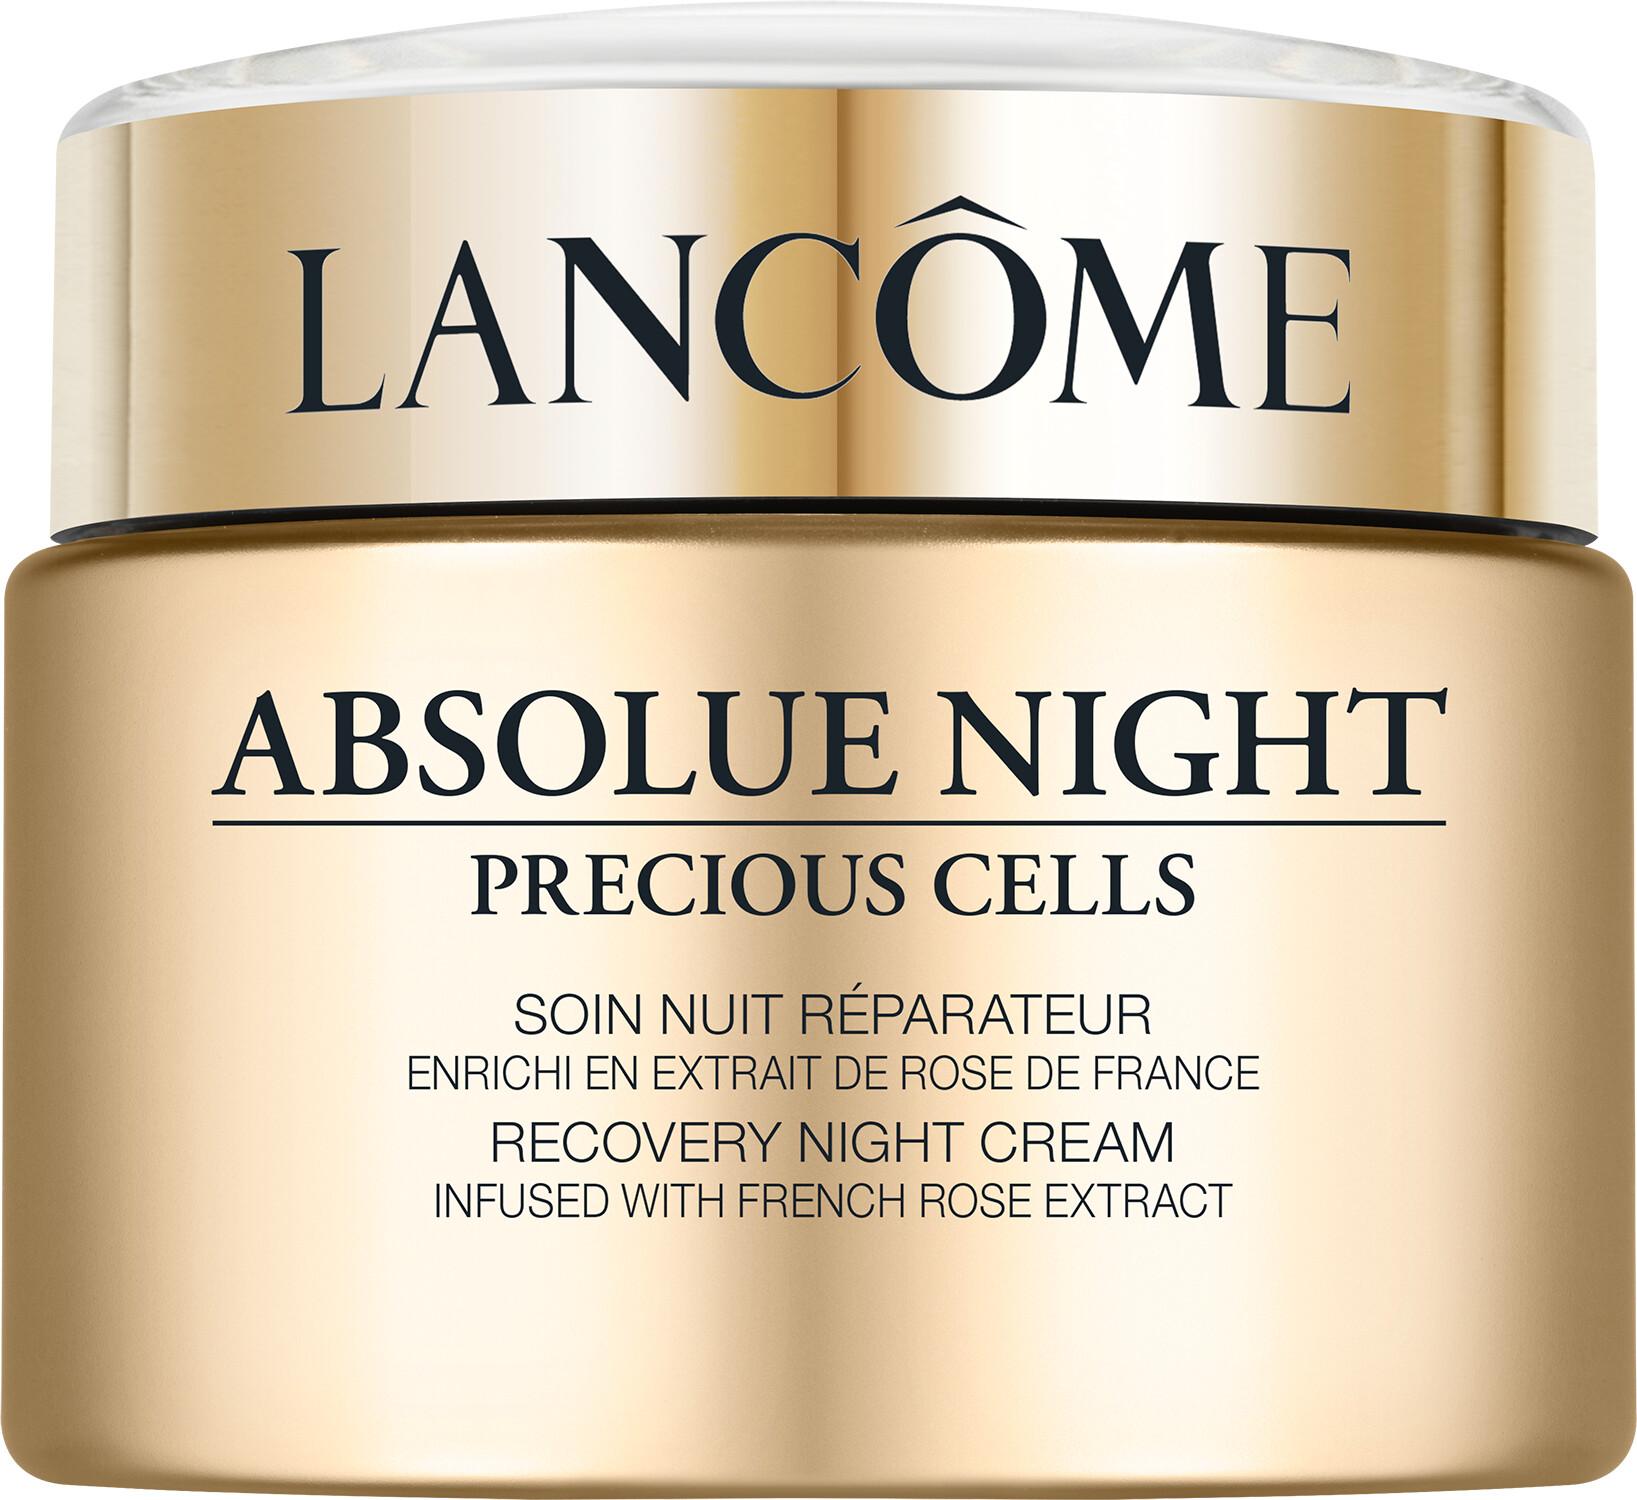 Lancome Absolue Night Precious Cells Recovery Night Cream 50ml